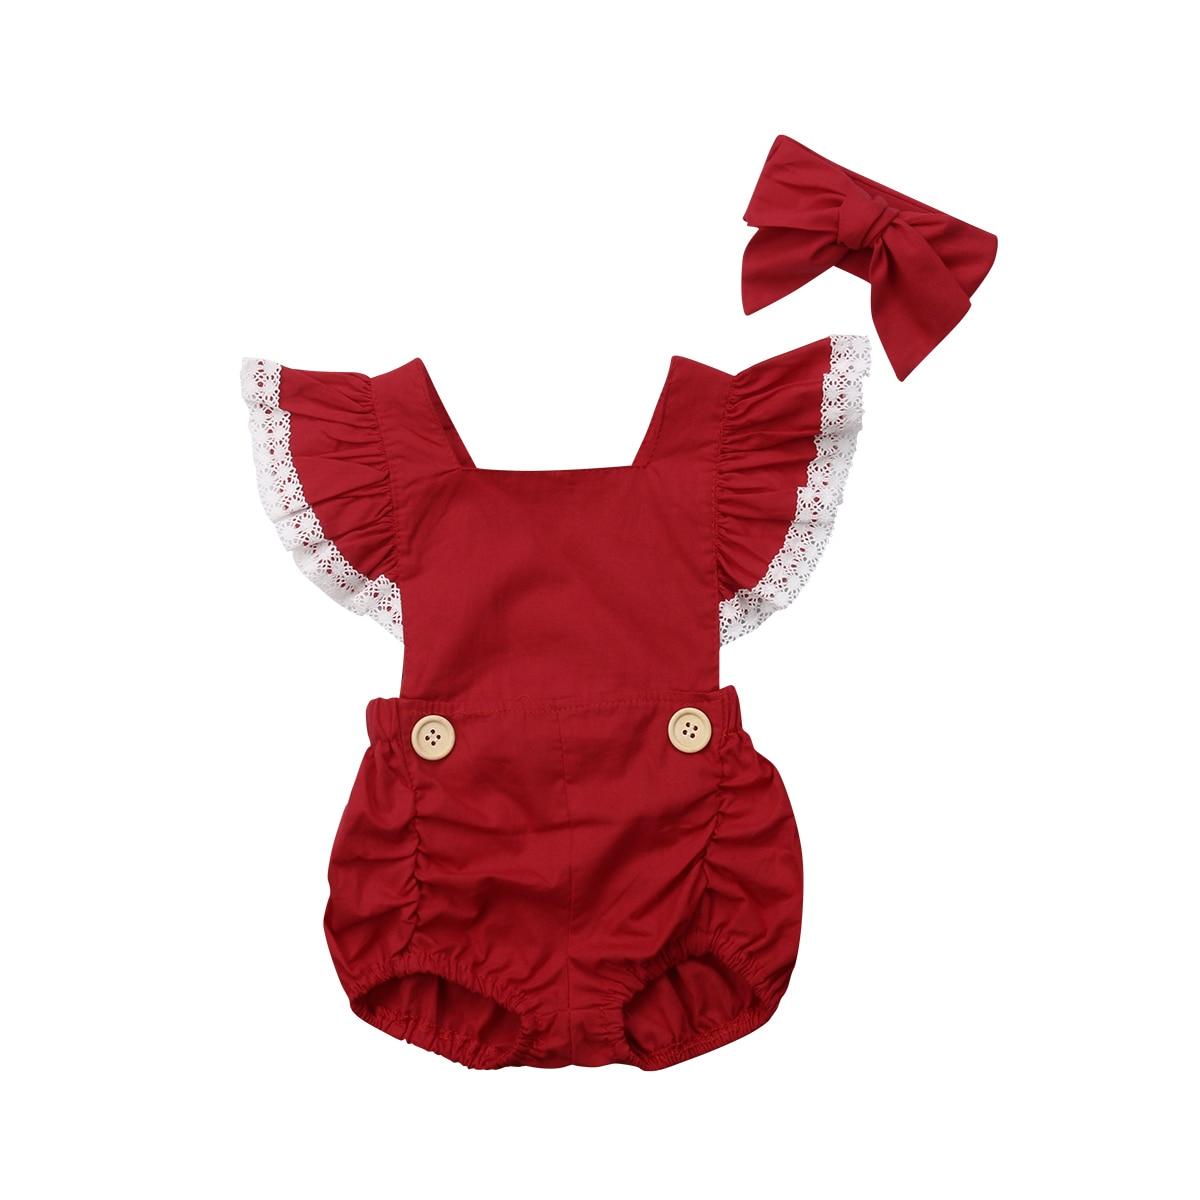 Christmas Newborn Baby Girl Clothes Ruffles Lace Sleeve Back Cross Princess Romper Jumpsuit Headband 2PCS Xmas Clothes